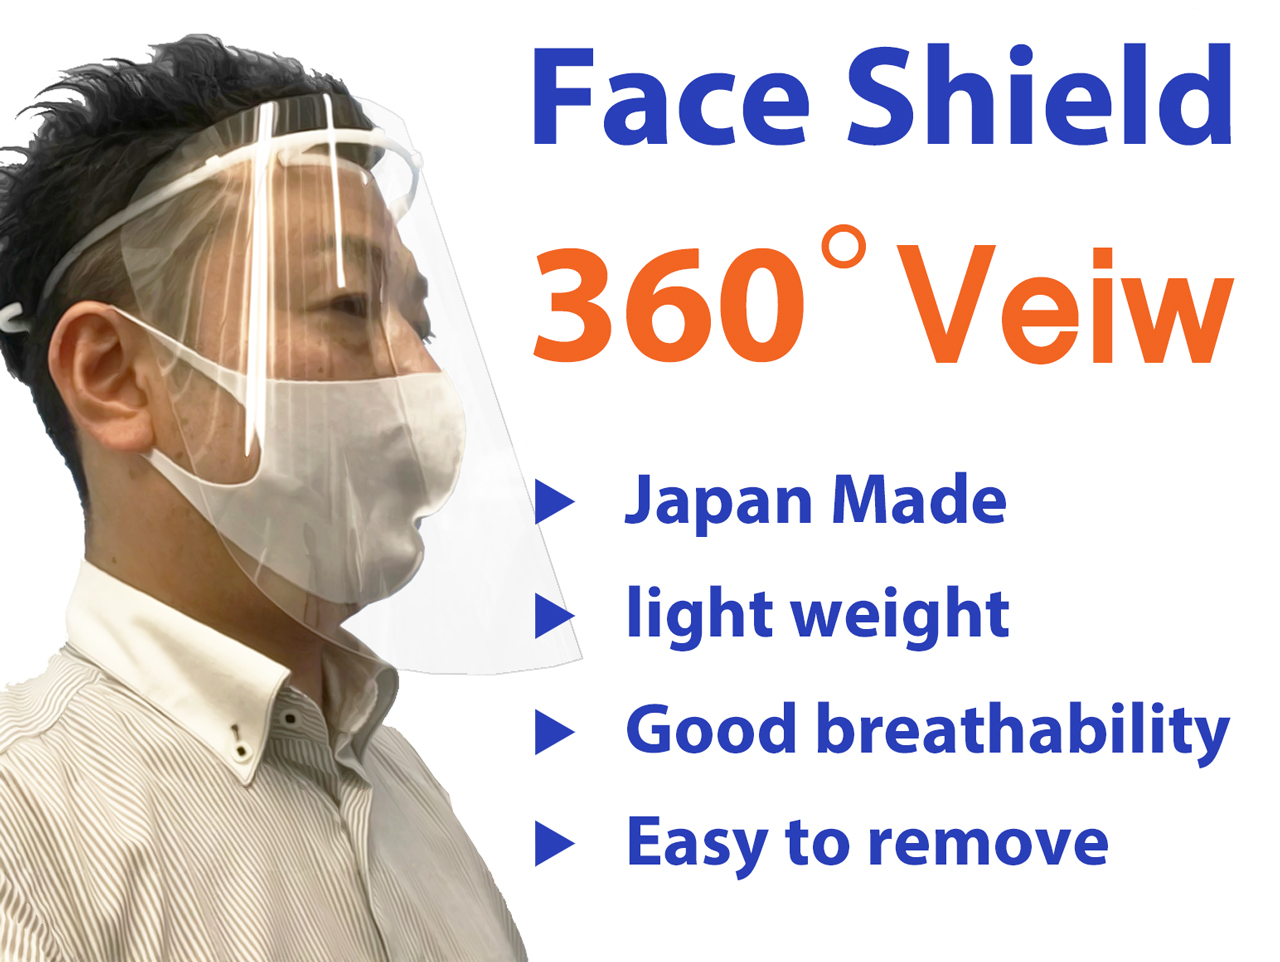 #,FACE SHIELD,フェイスシールド,の作り方,効果,手作り,マスク,楽天市場,yahooshop,Amazon,ヤマオカエンタープライズ